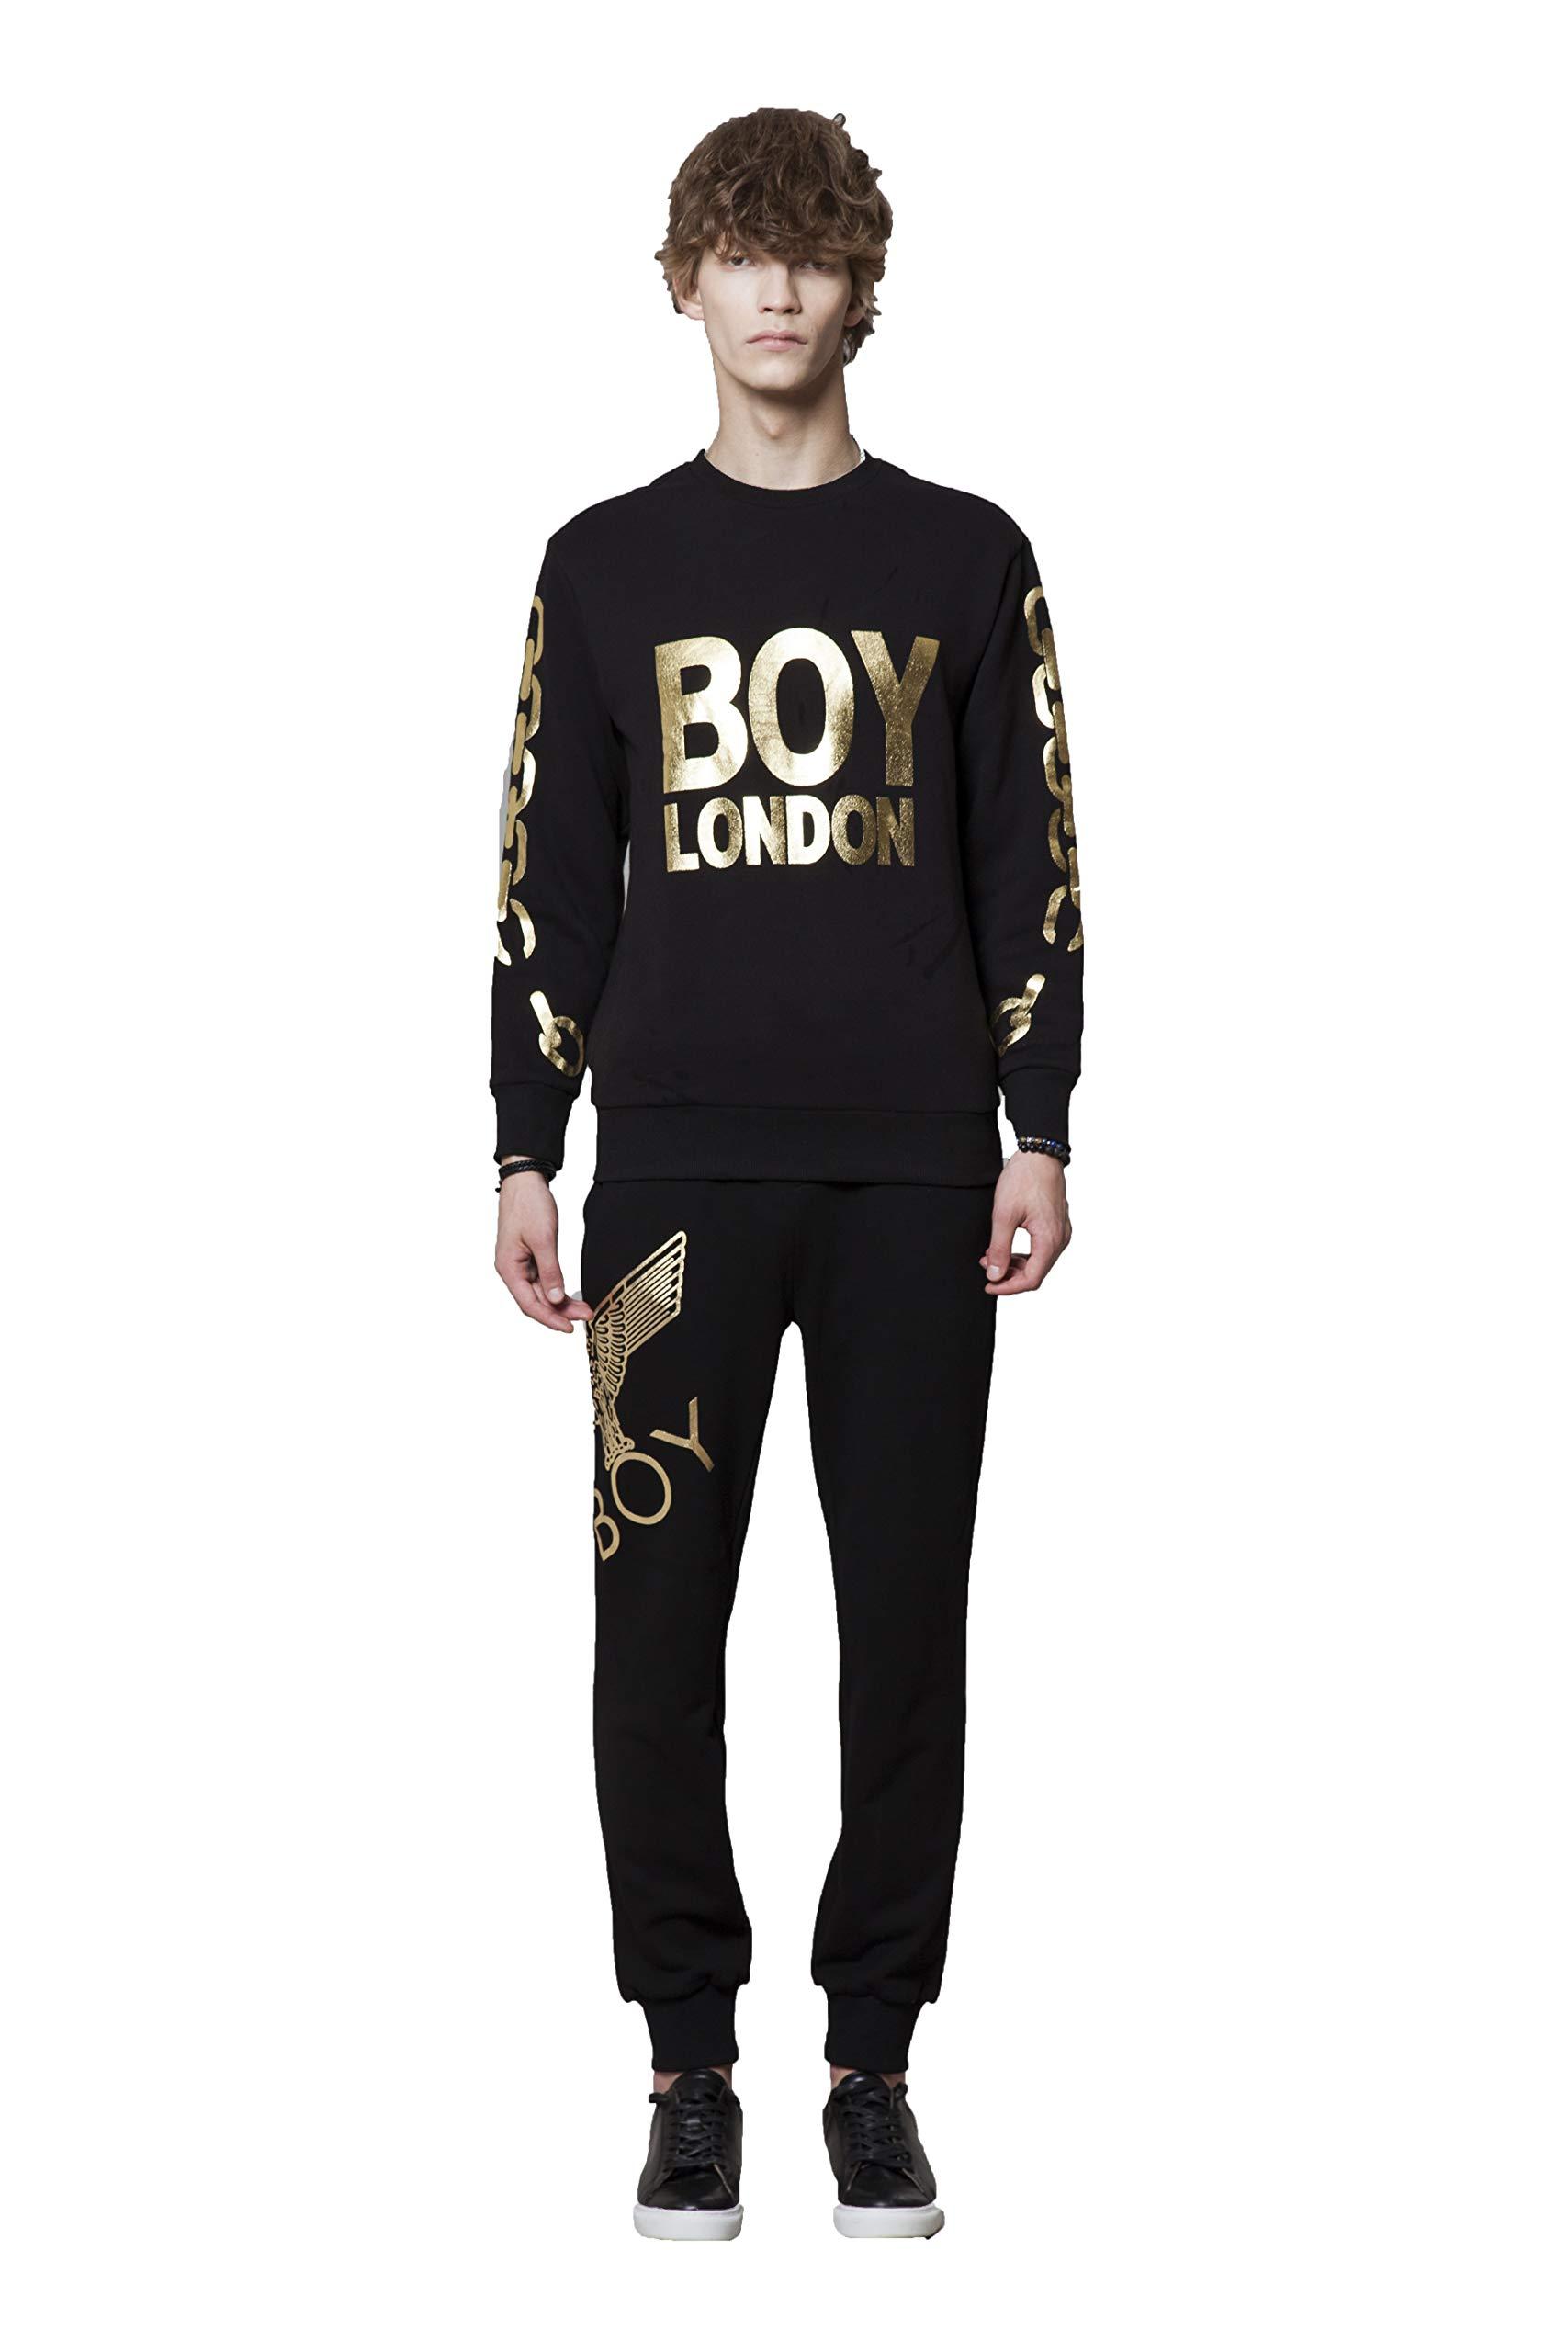 BOY LONDON Silver Chain Printed on Sleeves Sweatshirt-Black-Gold, Medium - BG4TL021